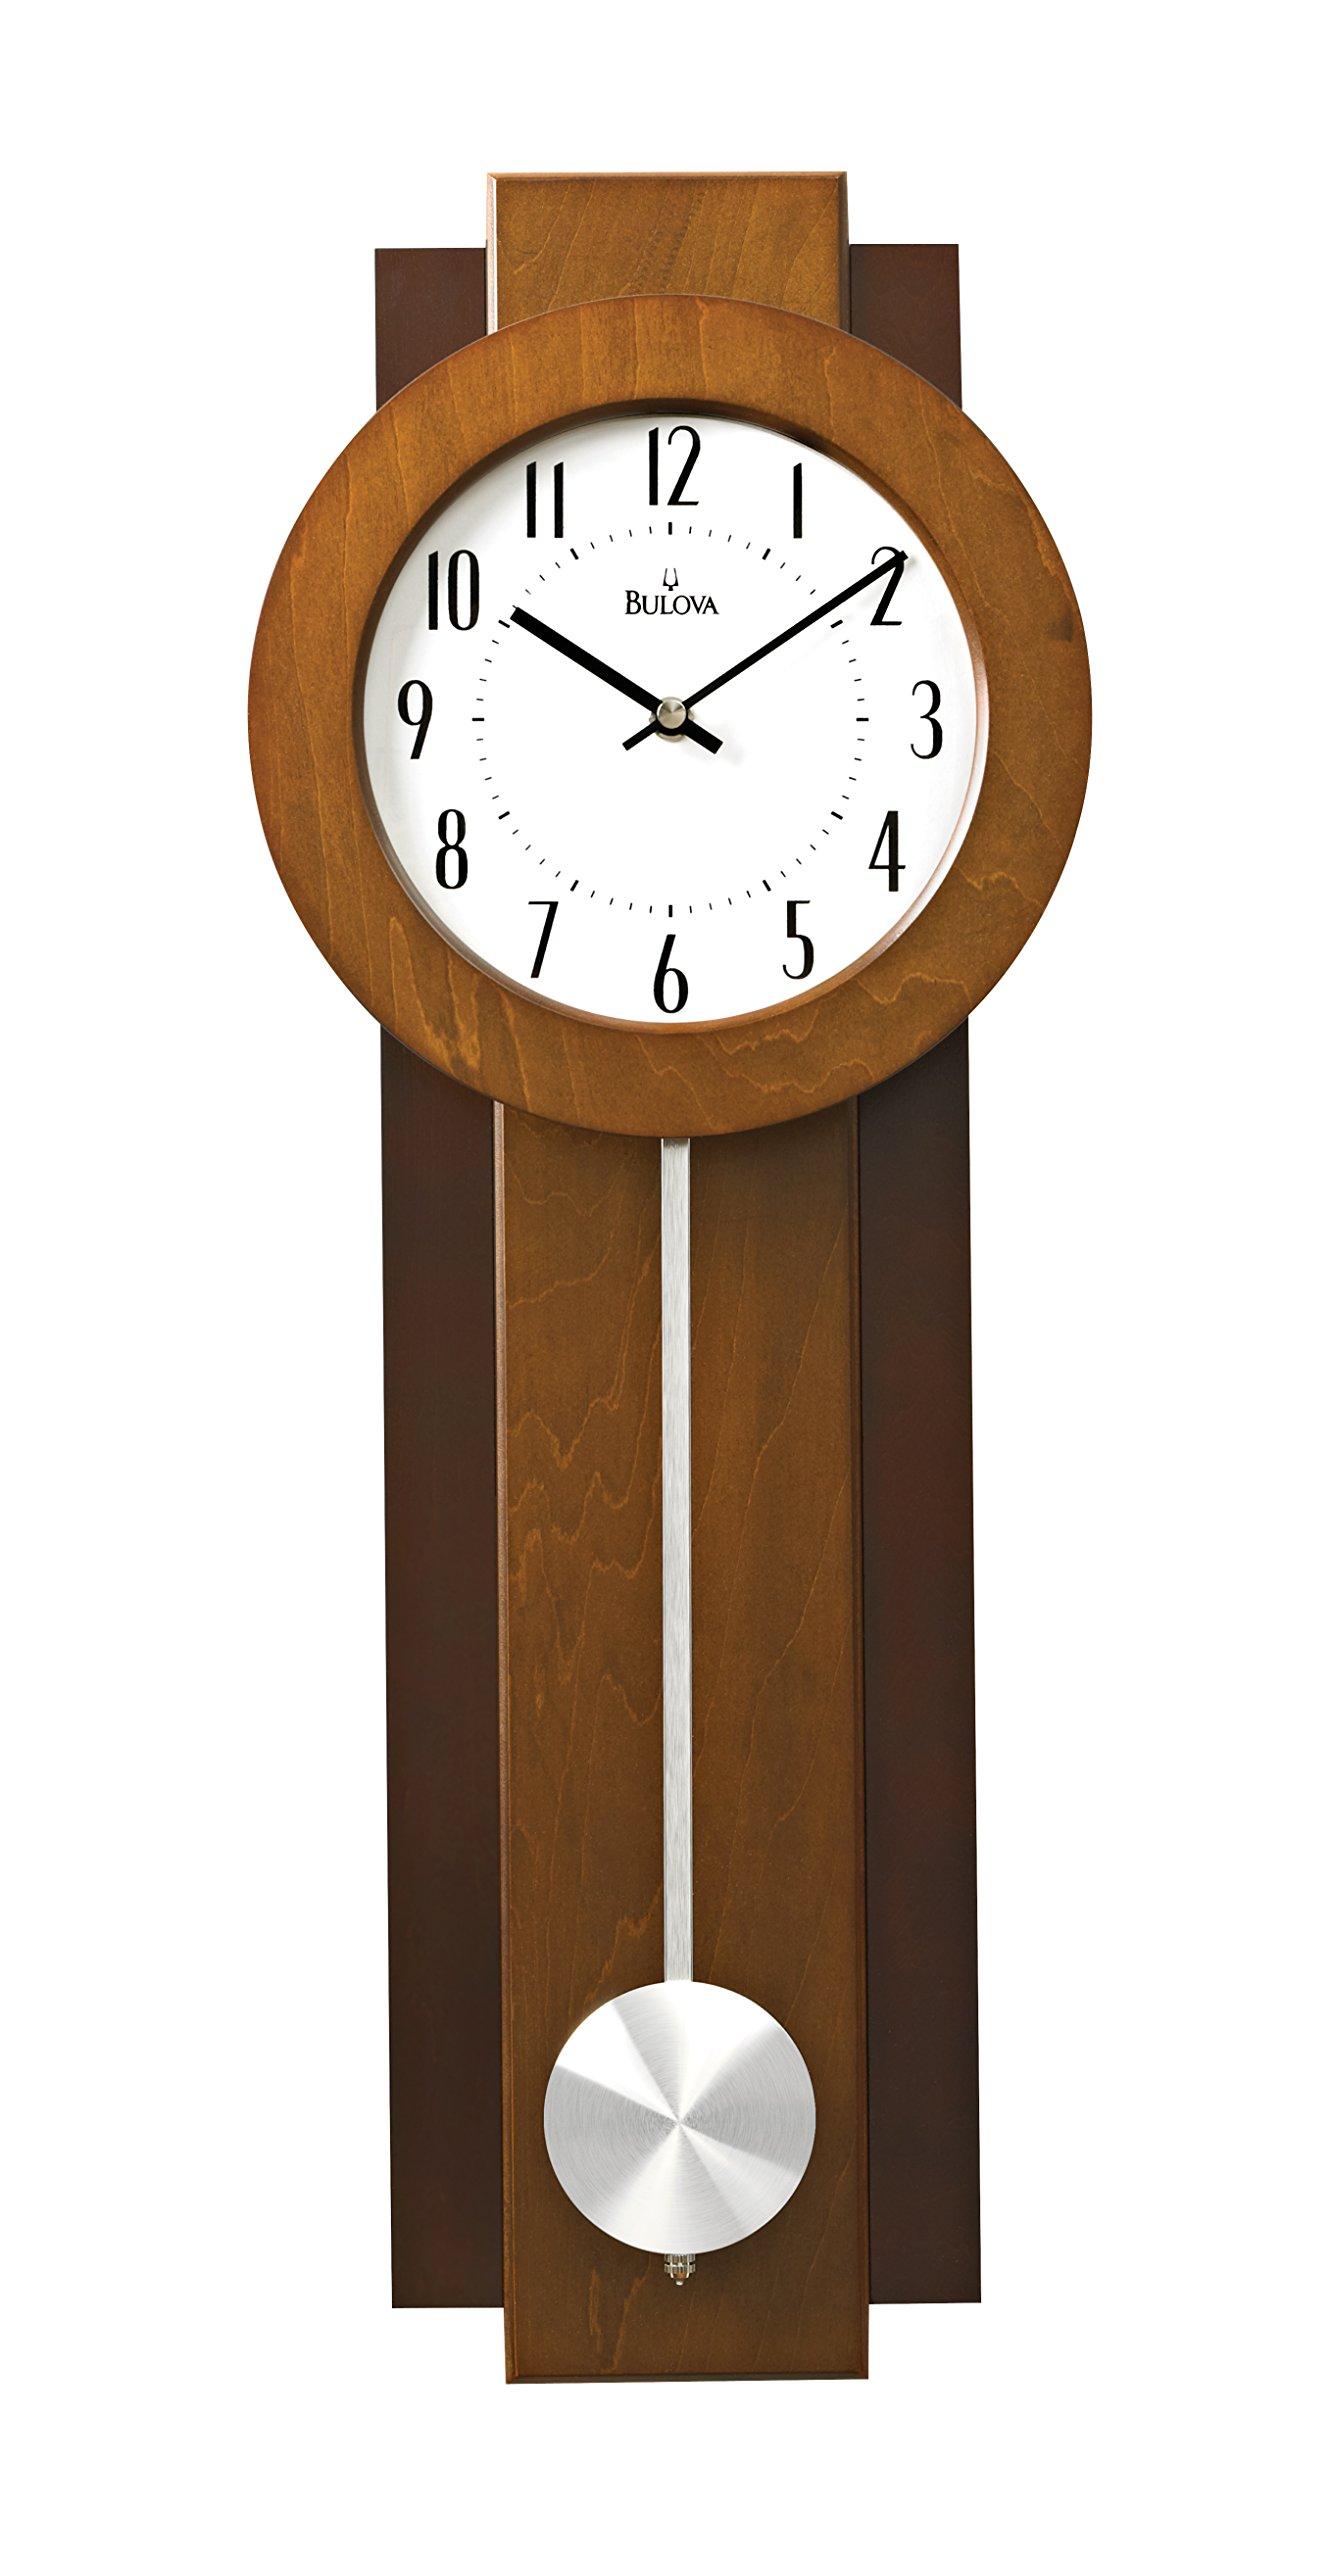 Bulova Avent Pendulum Deco Wall Clock C3383 Ebay